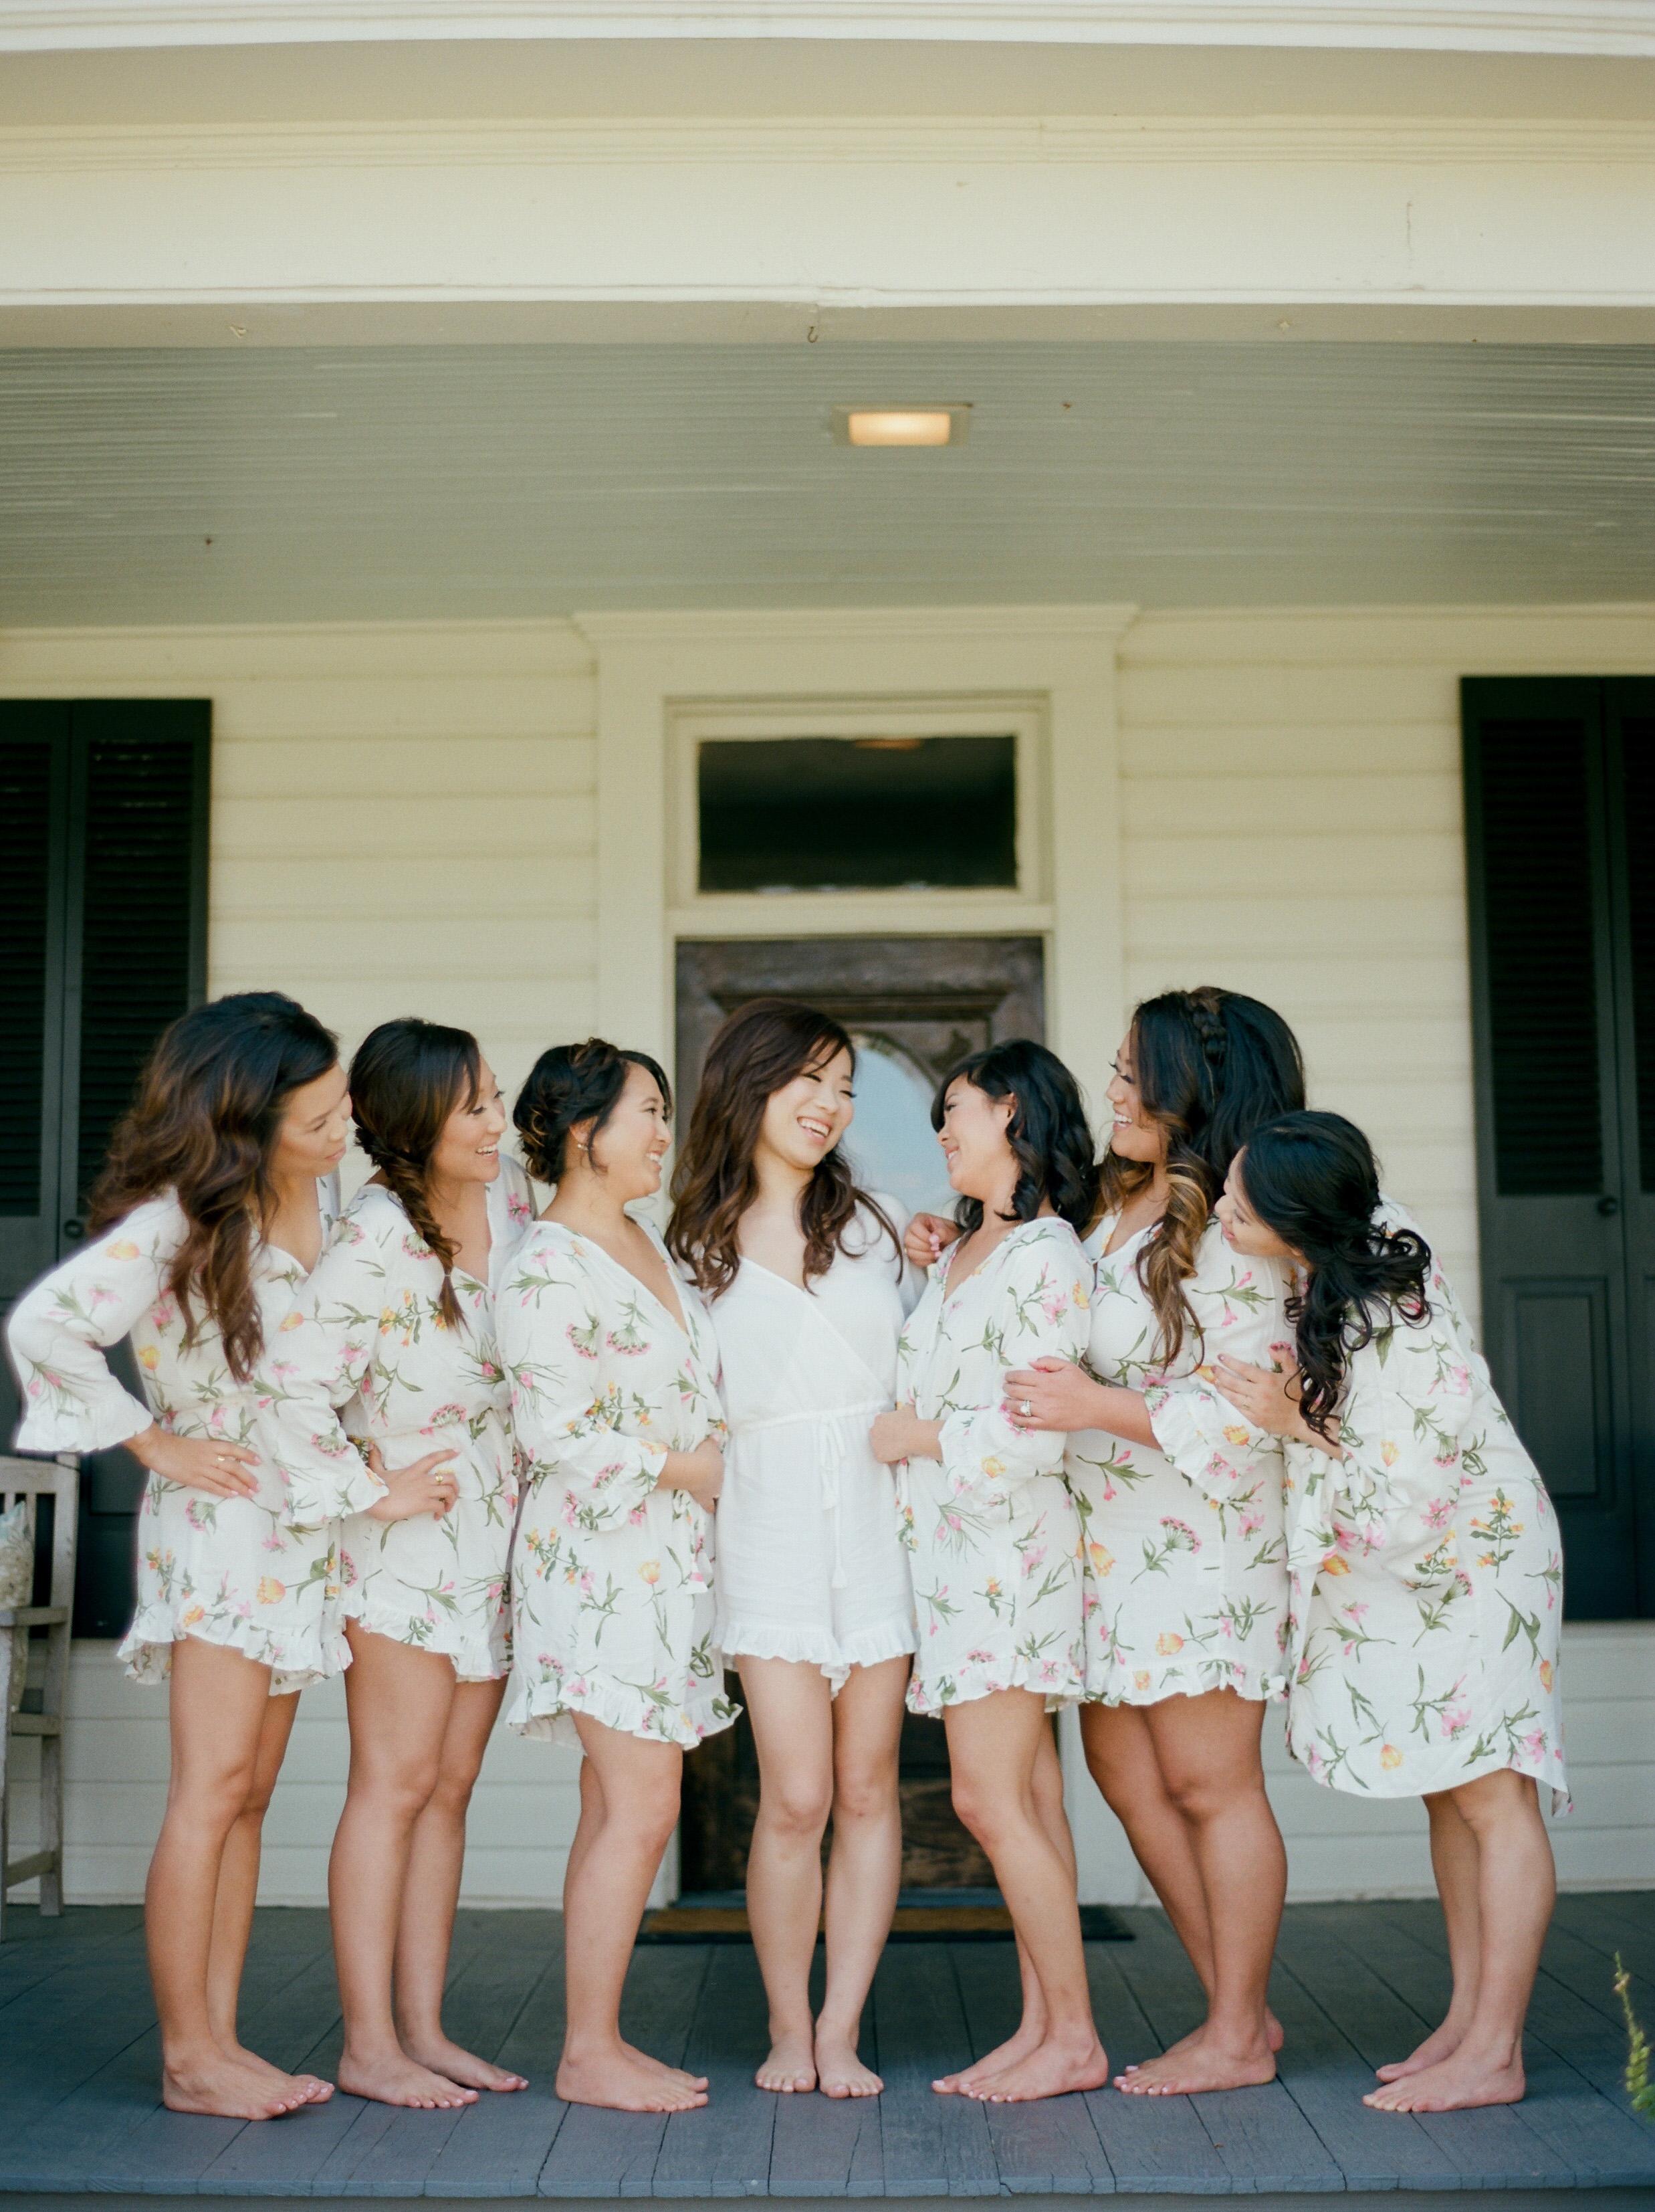 The-Knot-50-Weddings-50-States-Texas-Winner-Dana-Fernandez-photography-houston-wedding-photographer-film-fine-art-destination-7.jpg